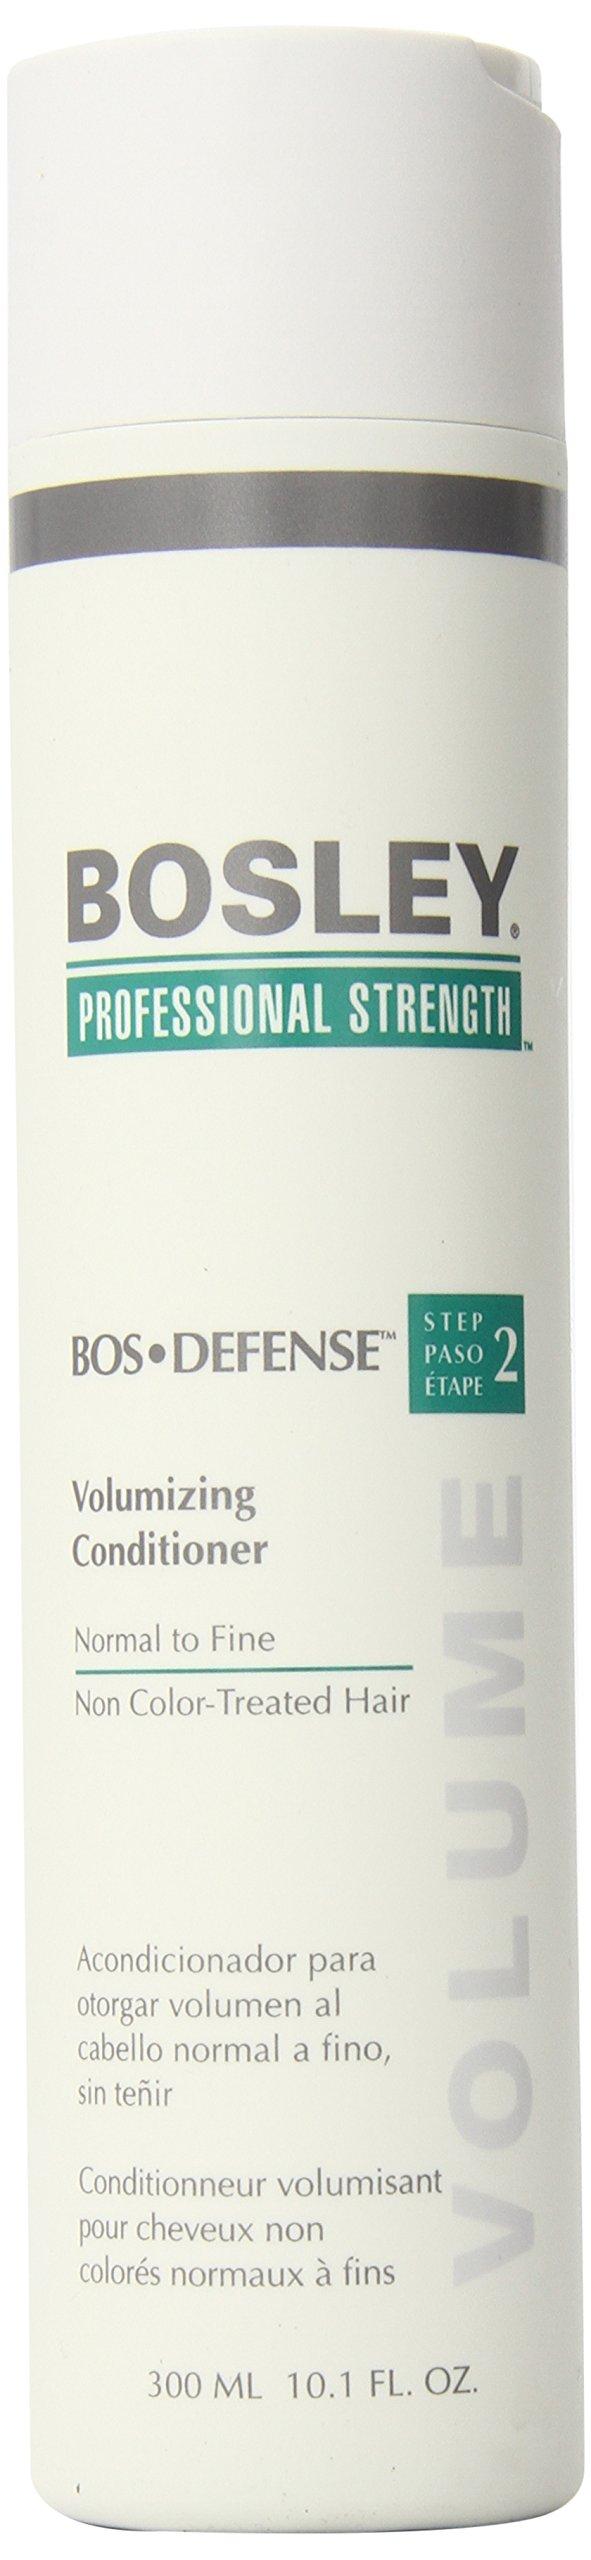 Bosley Professional Strength Bosdefense Conditioner For Non Color-Treated Hair, 10.1 oz.